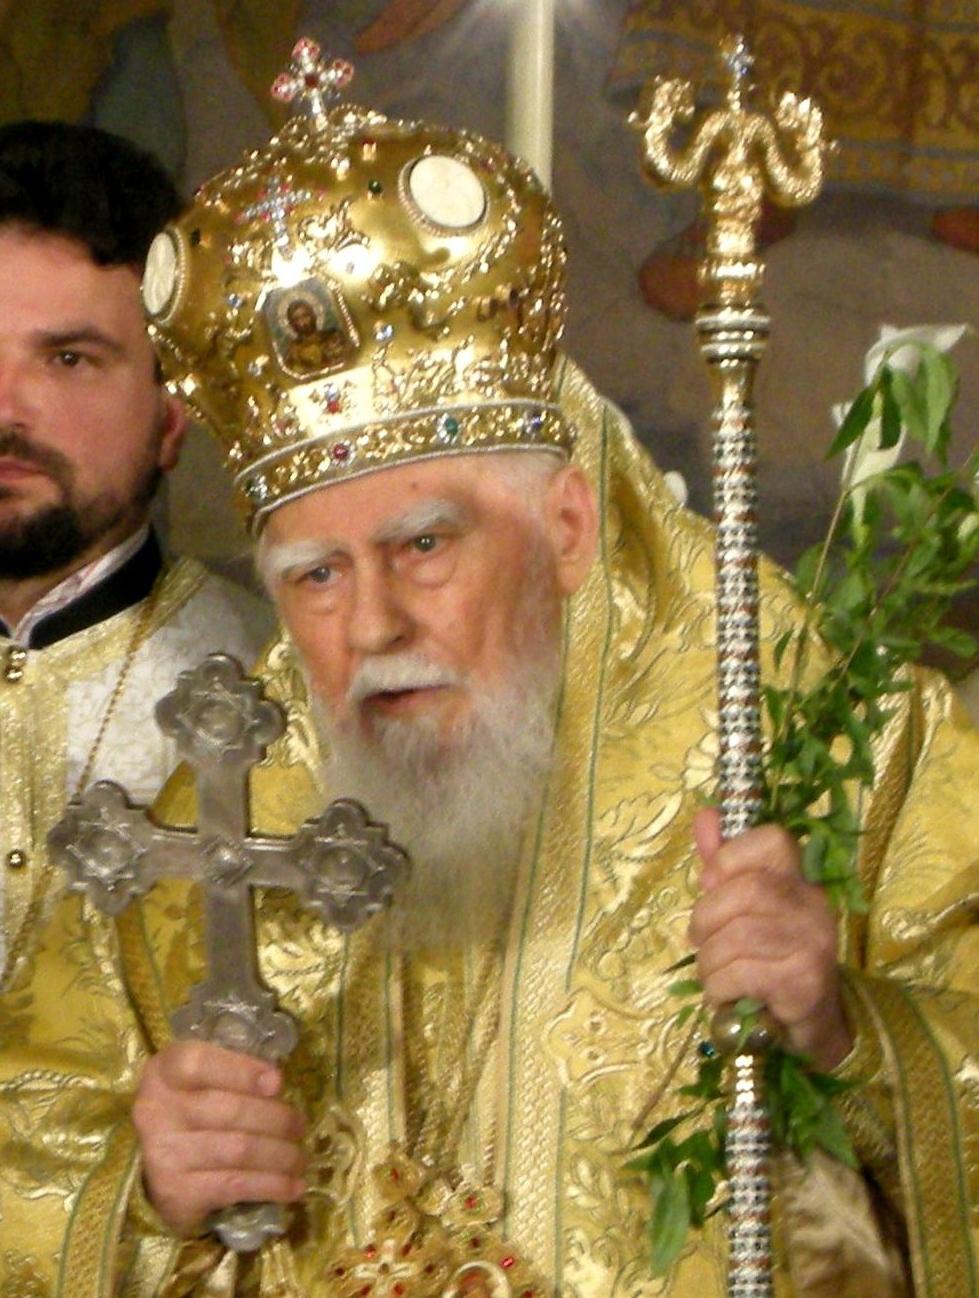 His Holiness Patriarch of Bulgaria Maxim